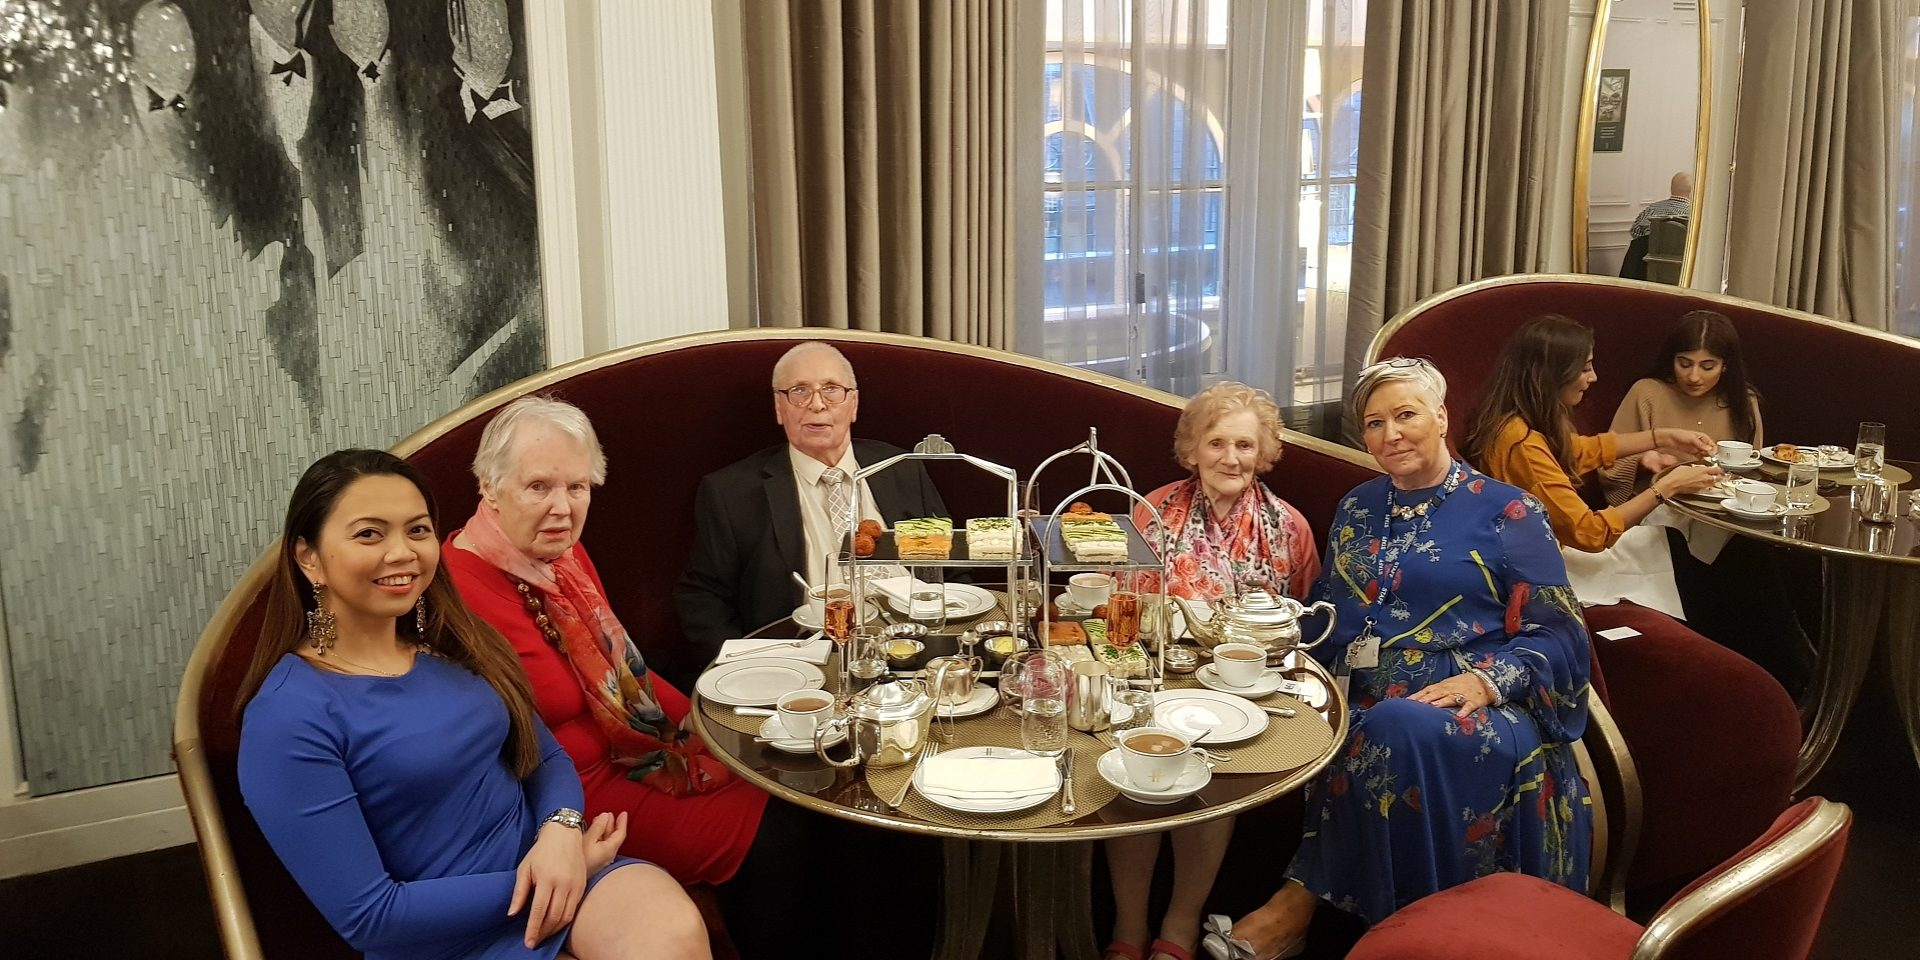 Torkington House resident gets a VIP treatment at Harrods